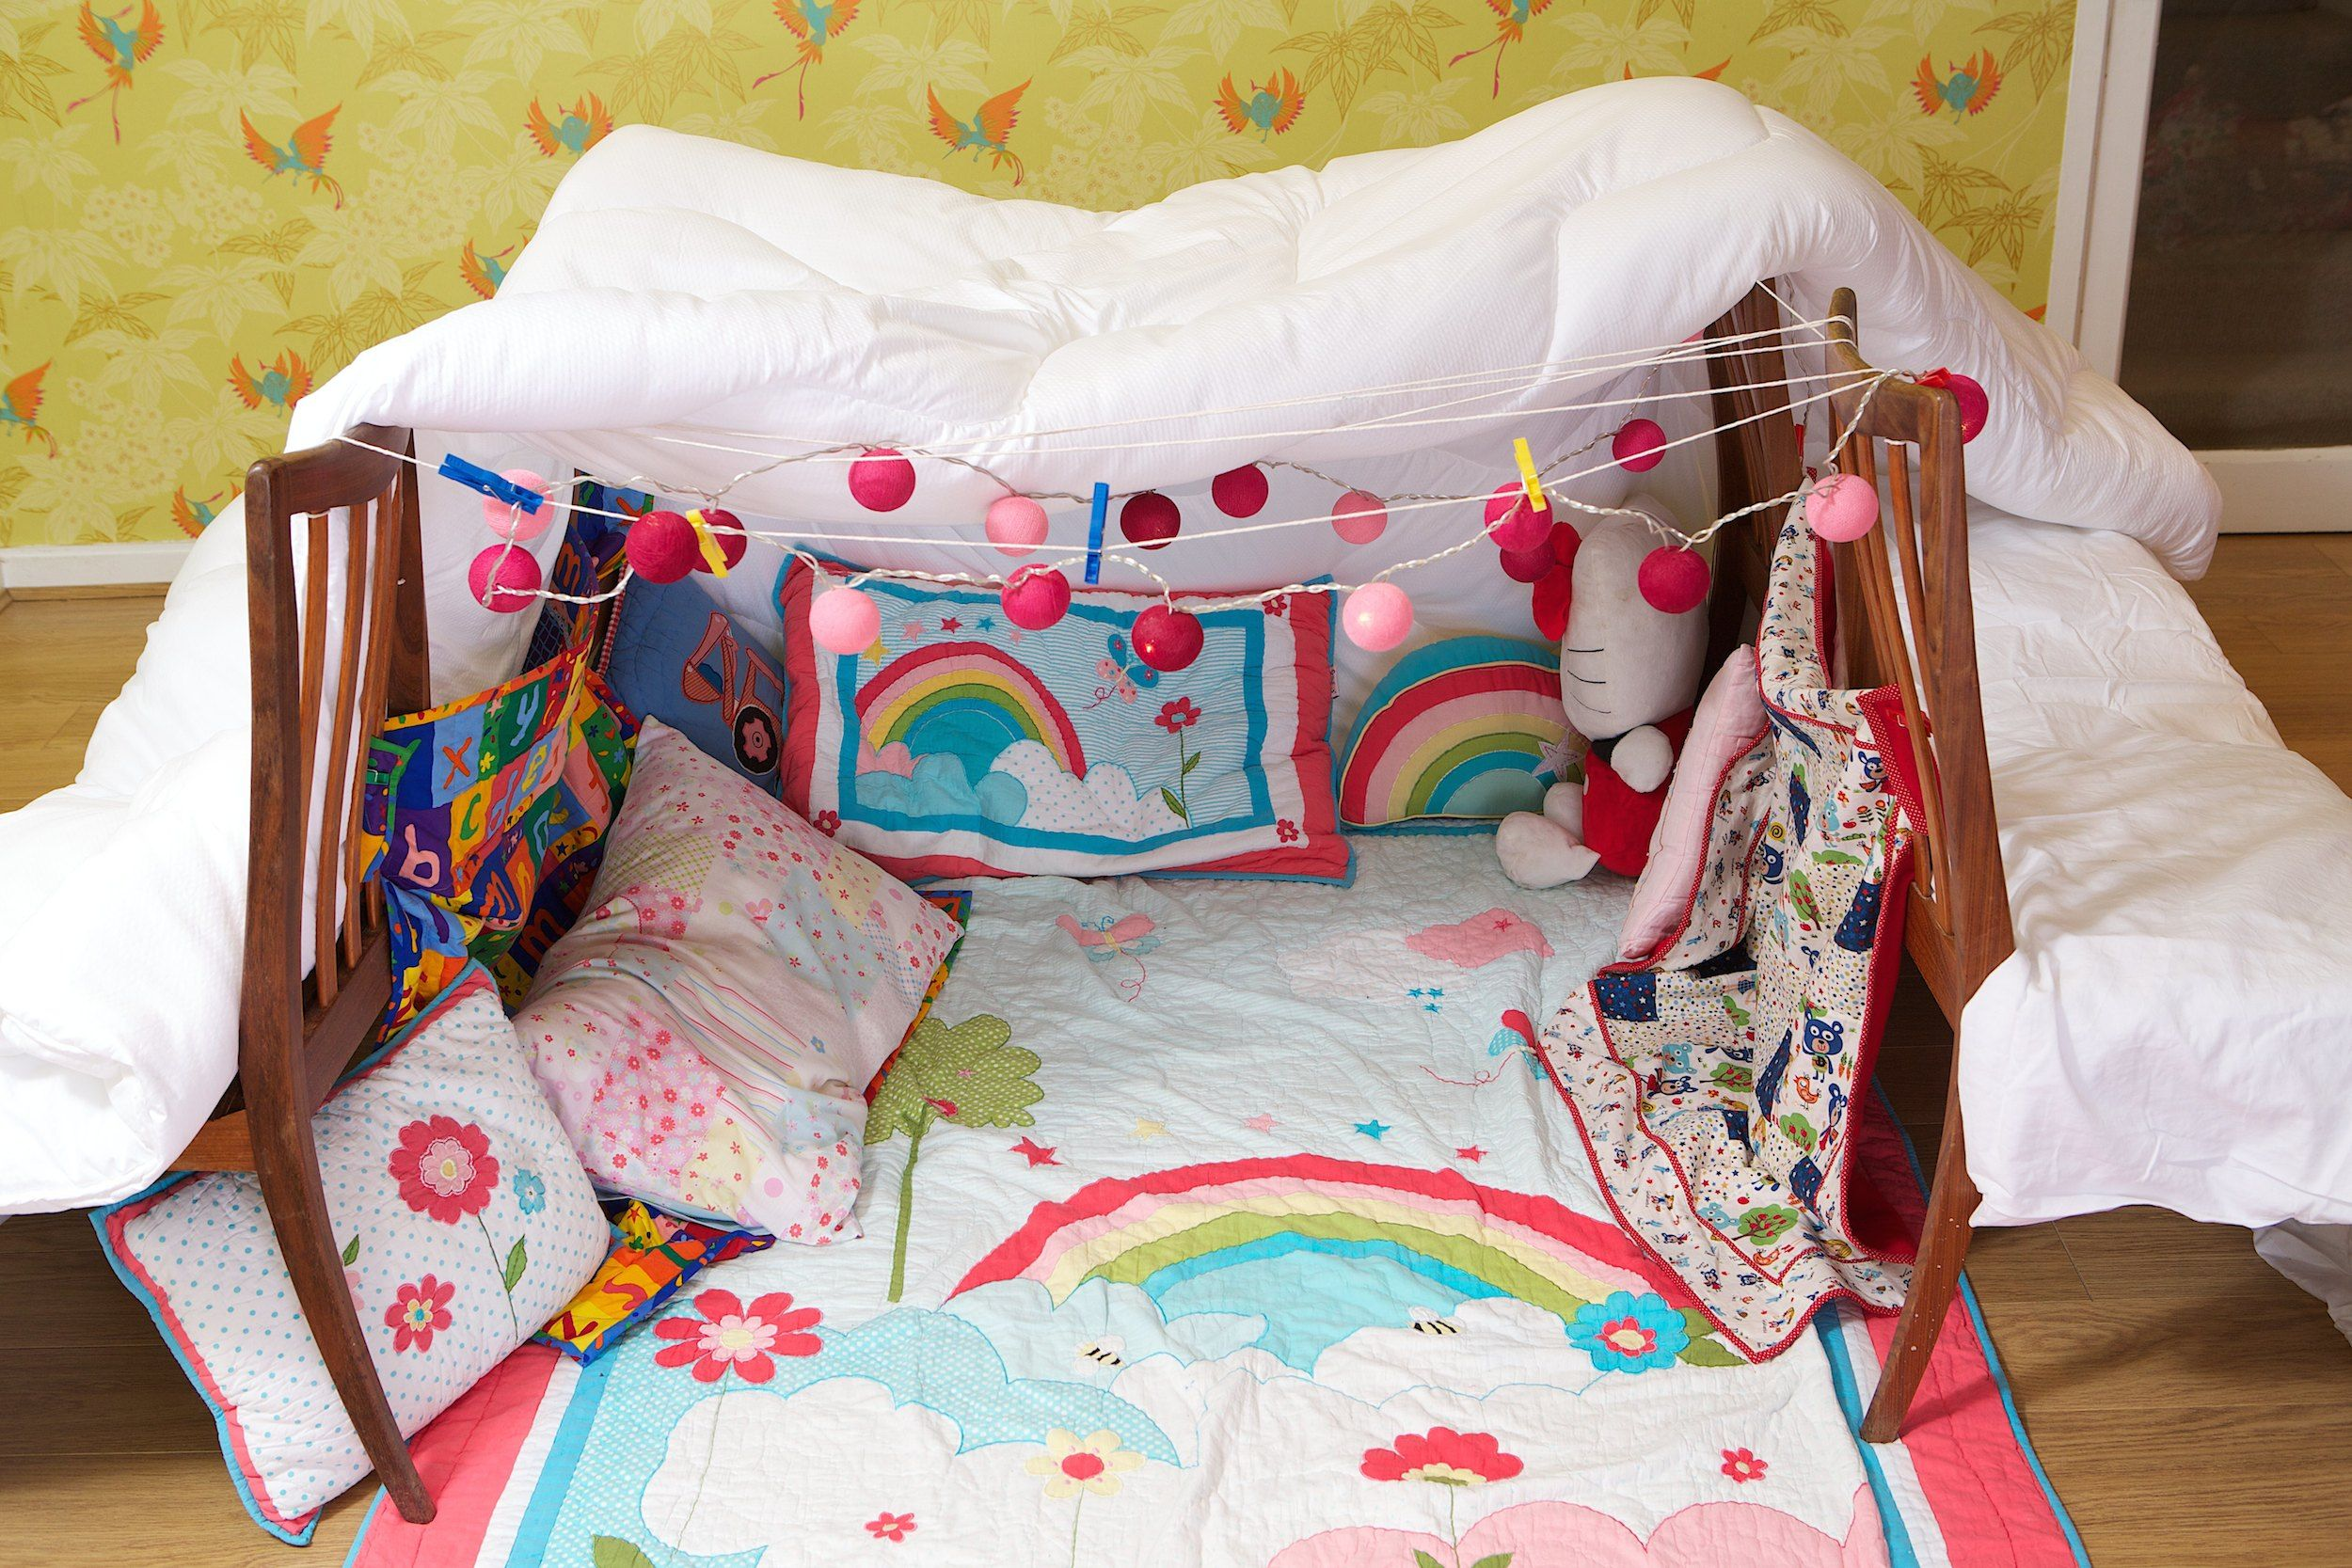 How To Build a Duvet Den (With images) | Fine bedding, Duvet ...